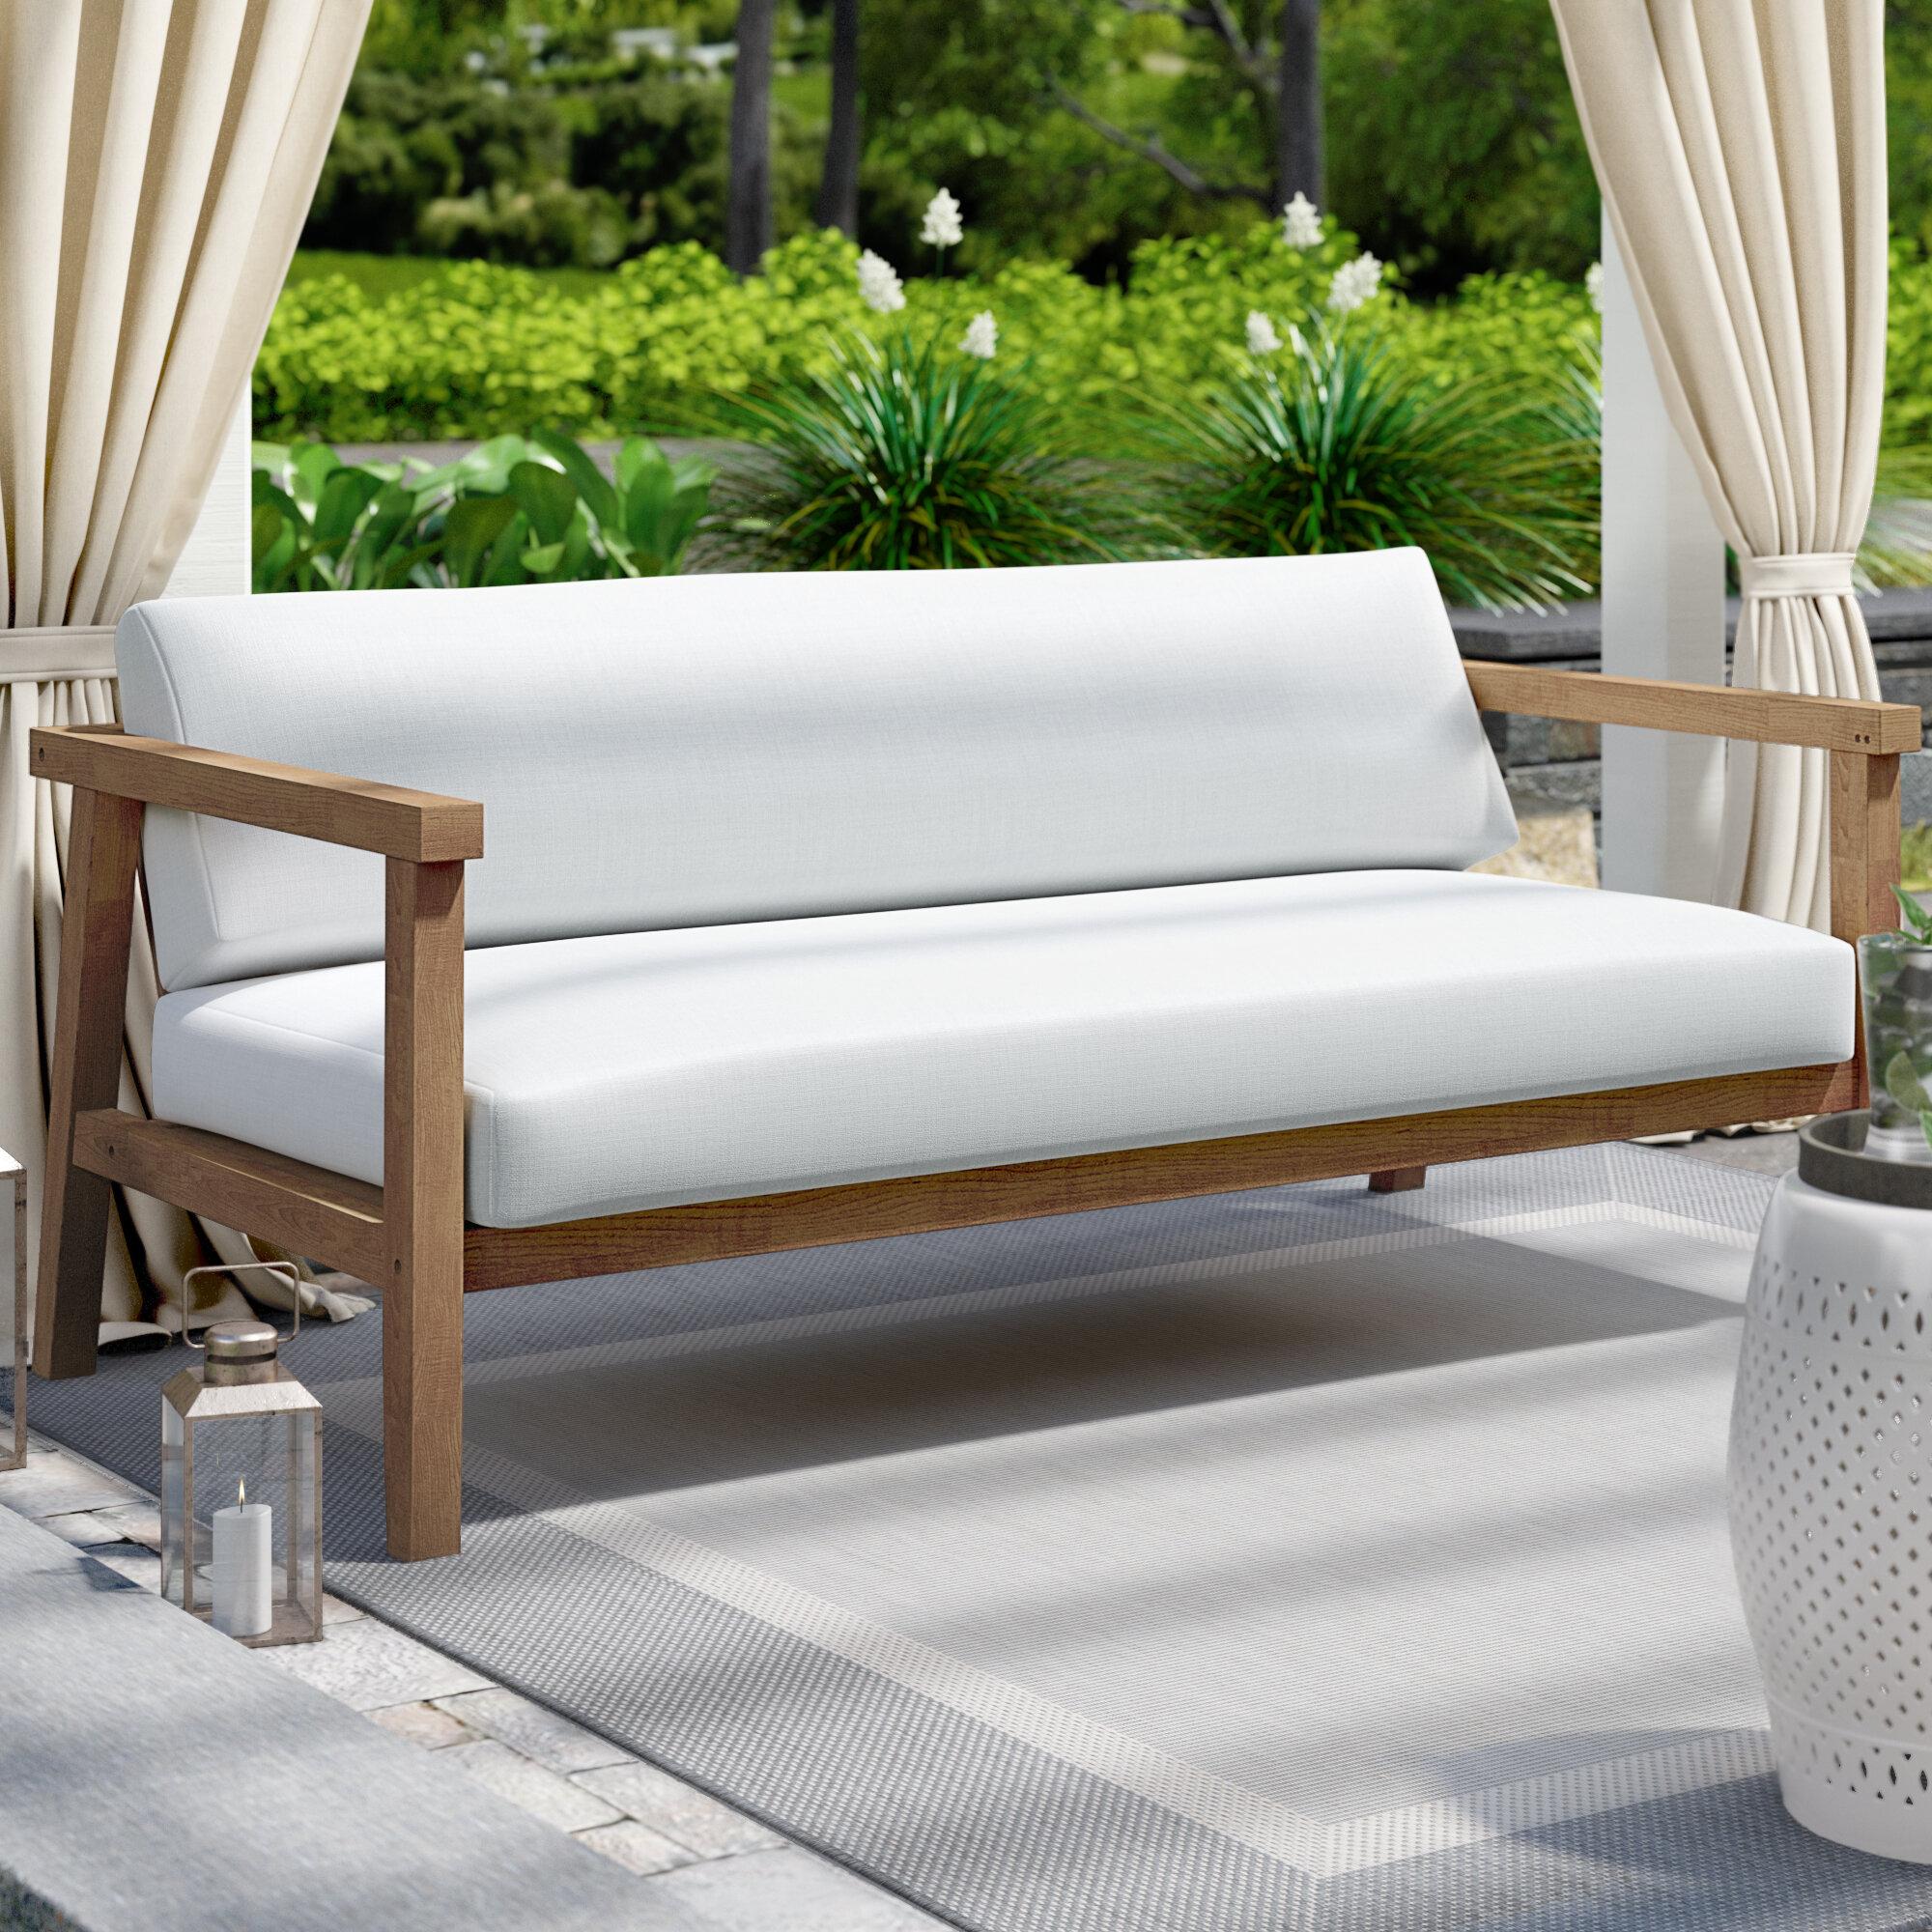 Bayou Breeze Edmeston Outdoor Teak Loveseat with Cushions & Reviews ...